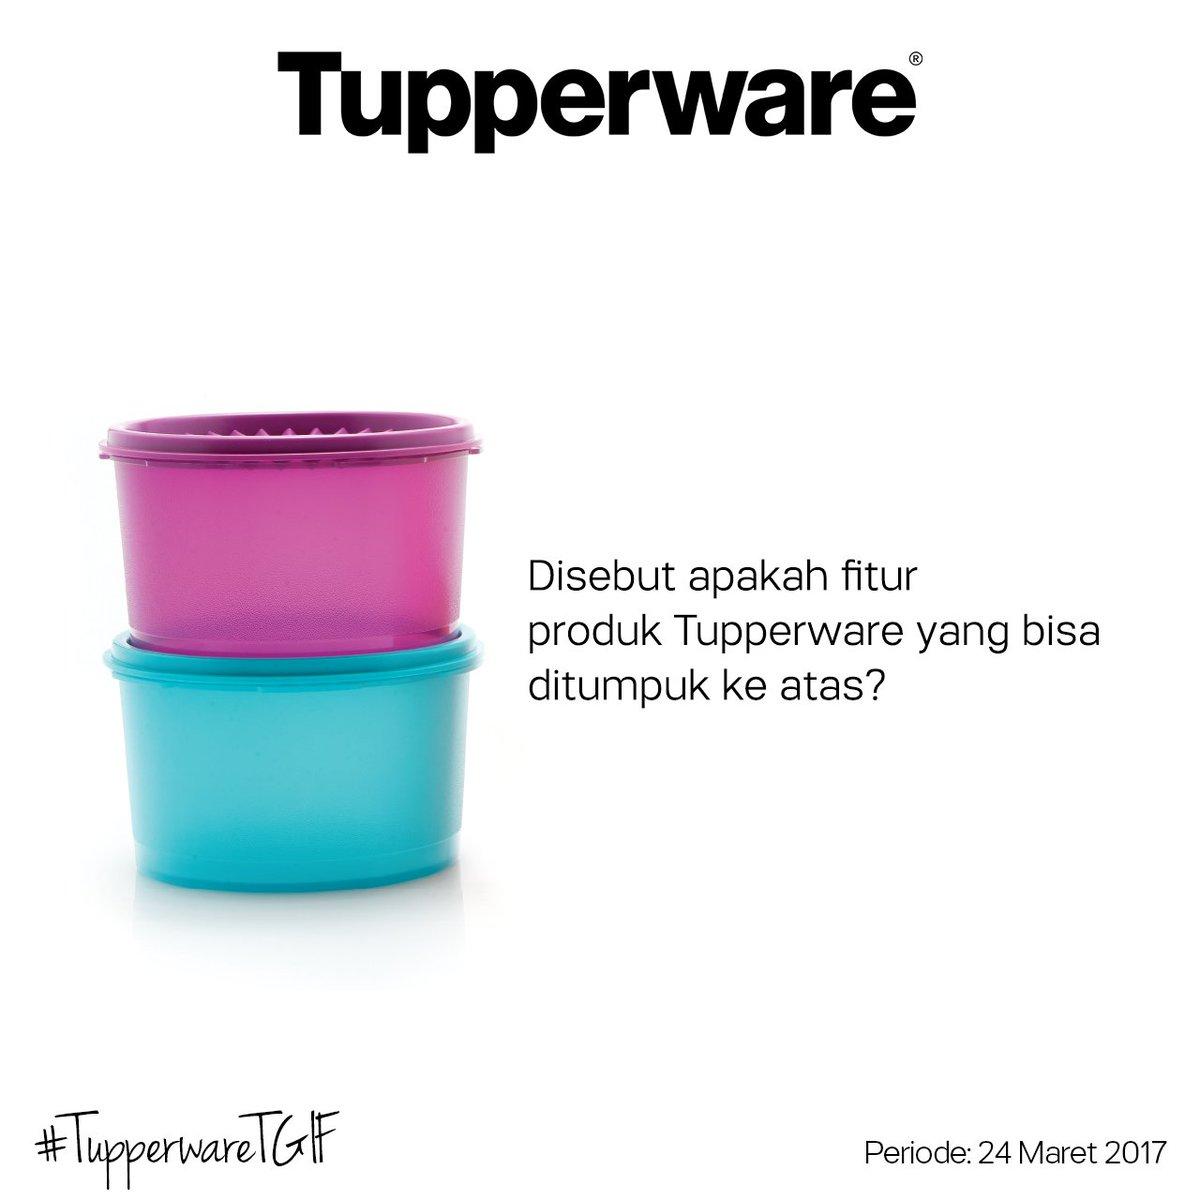 Lusi Anggraeni Lusianggraeni Twitter Produk Ukm Bumn Taperware 400 Replies 312 Retweets 86 Likes